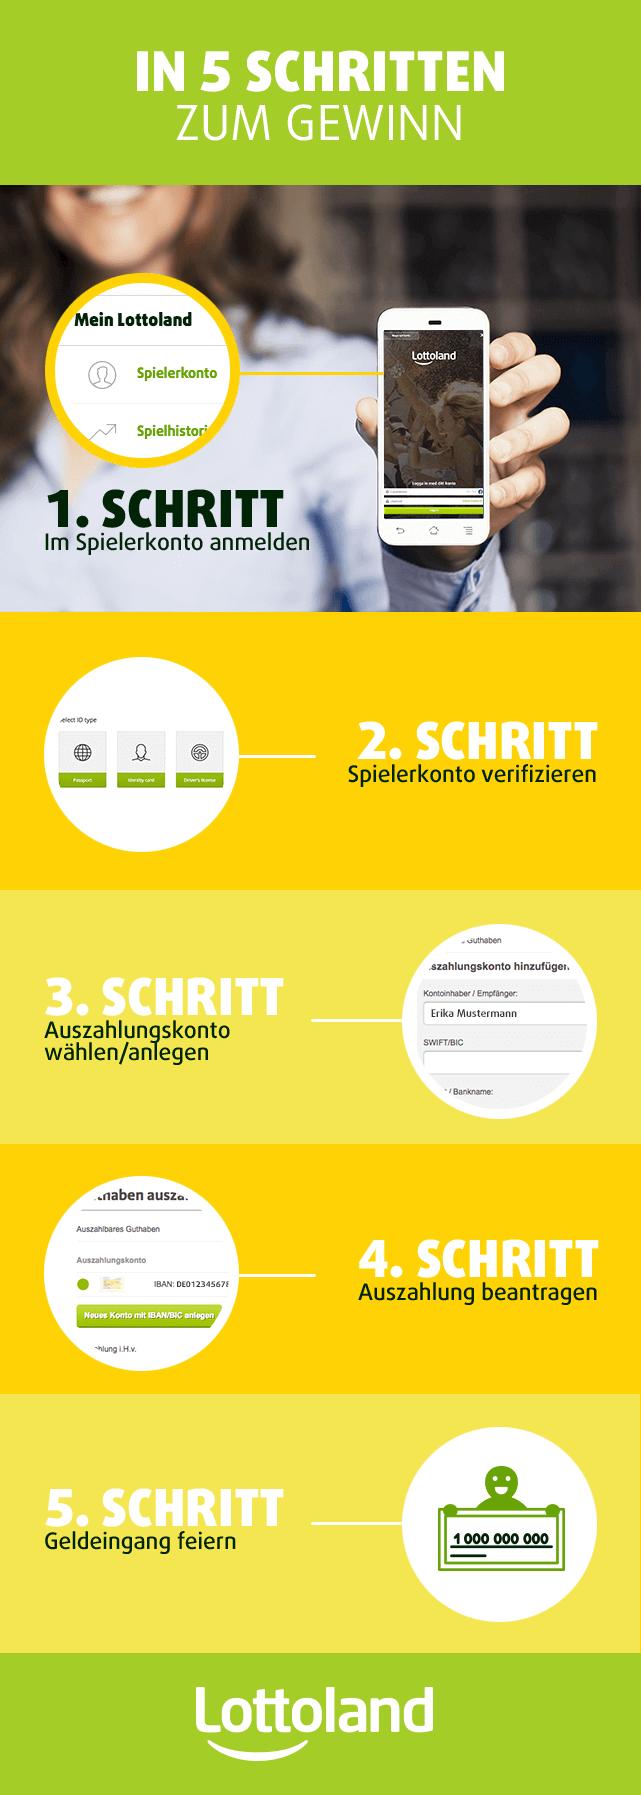 Www.Lottoland.Com/Mein Lottoland/Spielerkonto